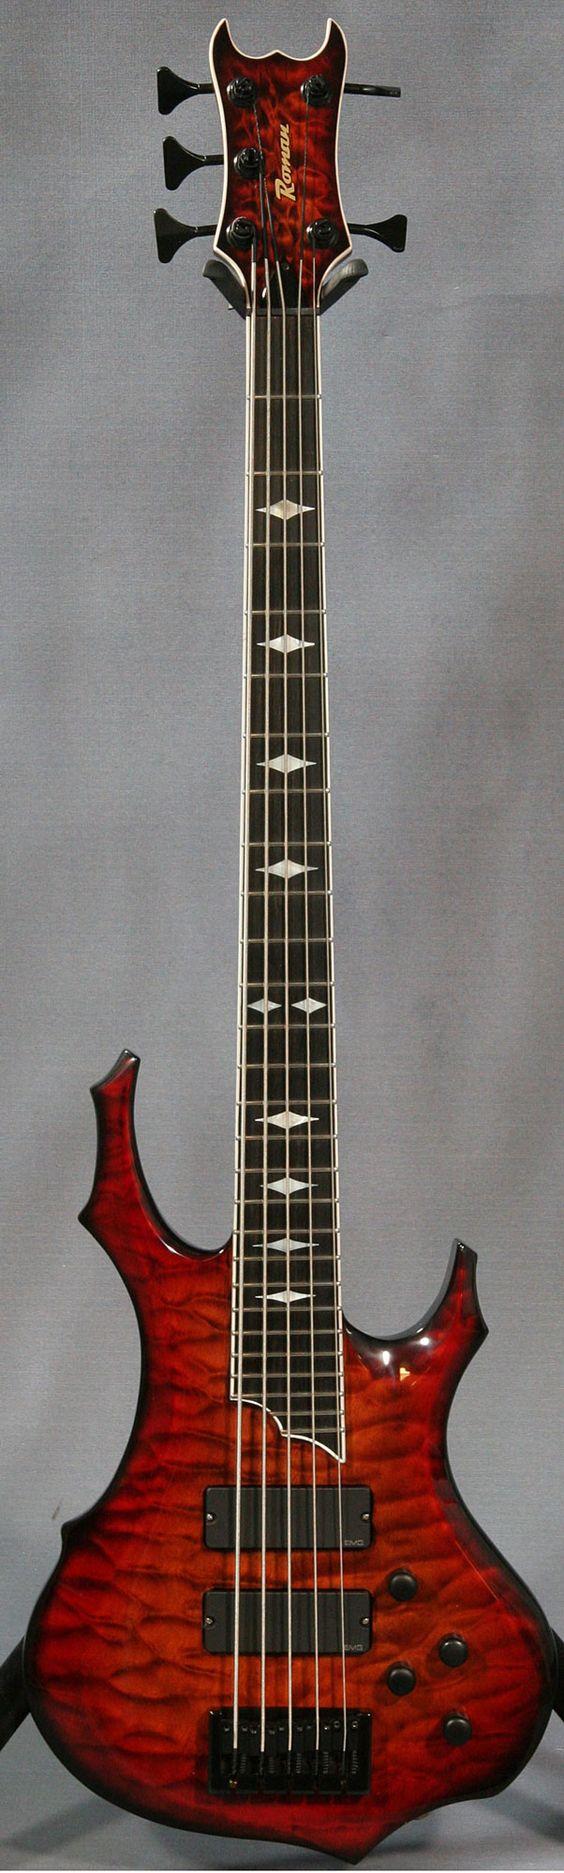 Ed Roman Custom 5 String Bass Guitar